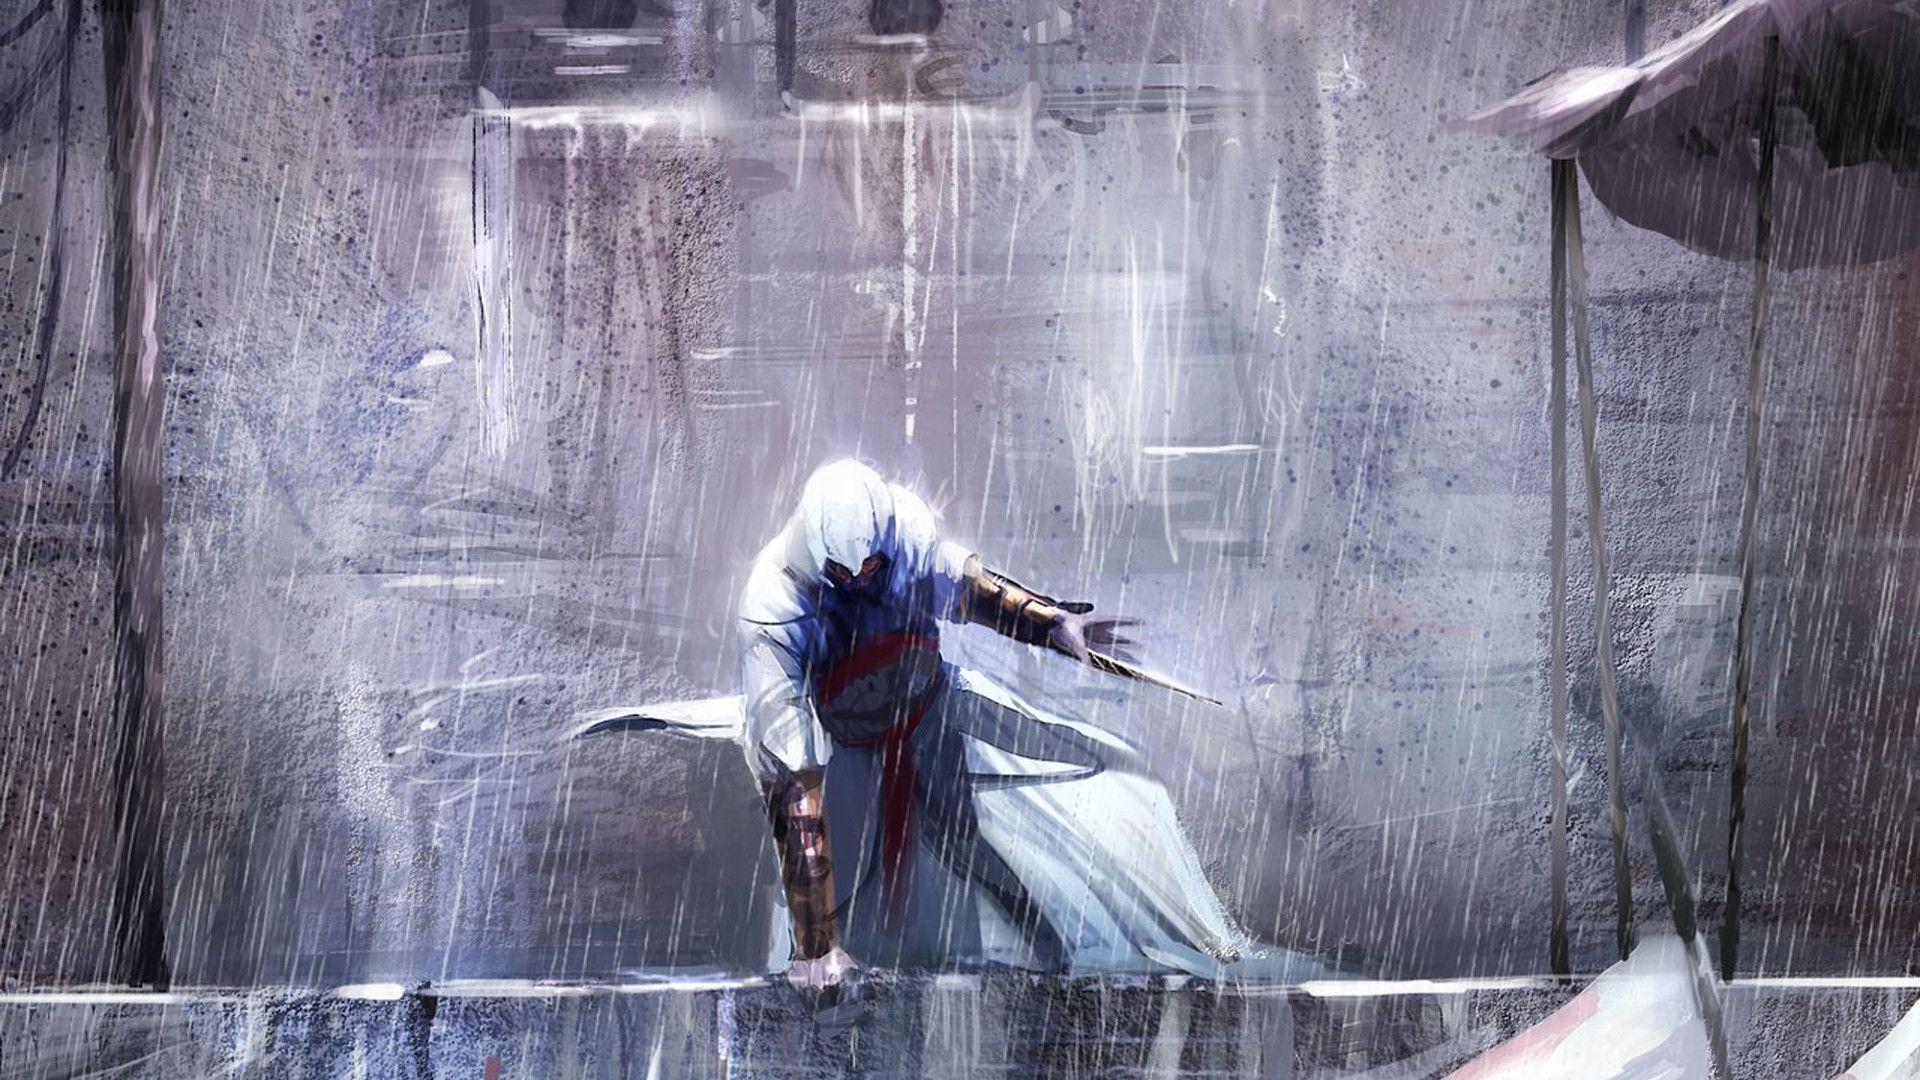 Assassin's Creed Wallpaper HD